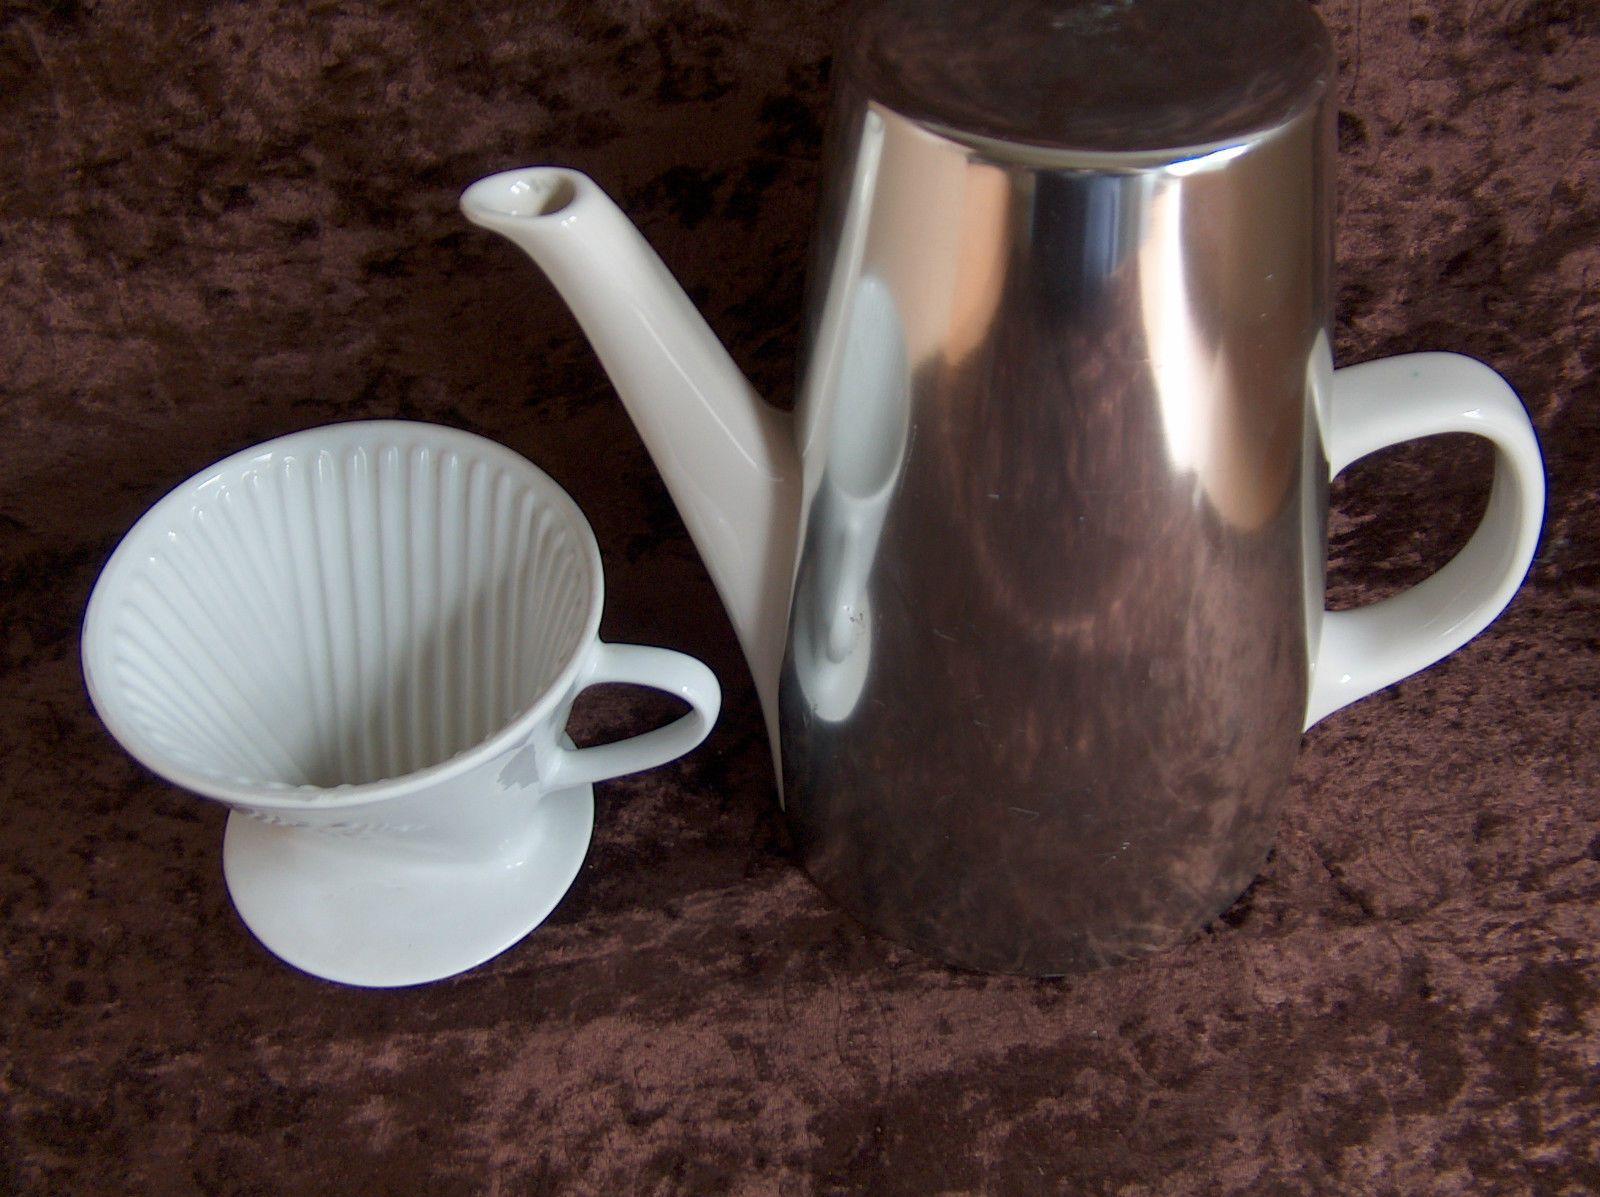 alte melitta kaffeekanne isolierhaube versilbert melitta porzellan filter 102 ebay 25 1 x. Black Bedroom Furniture Sets. Home Design Ideas